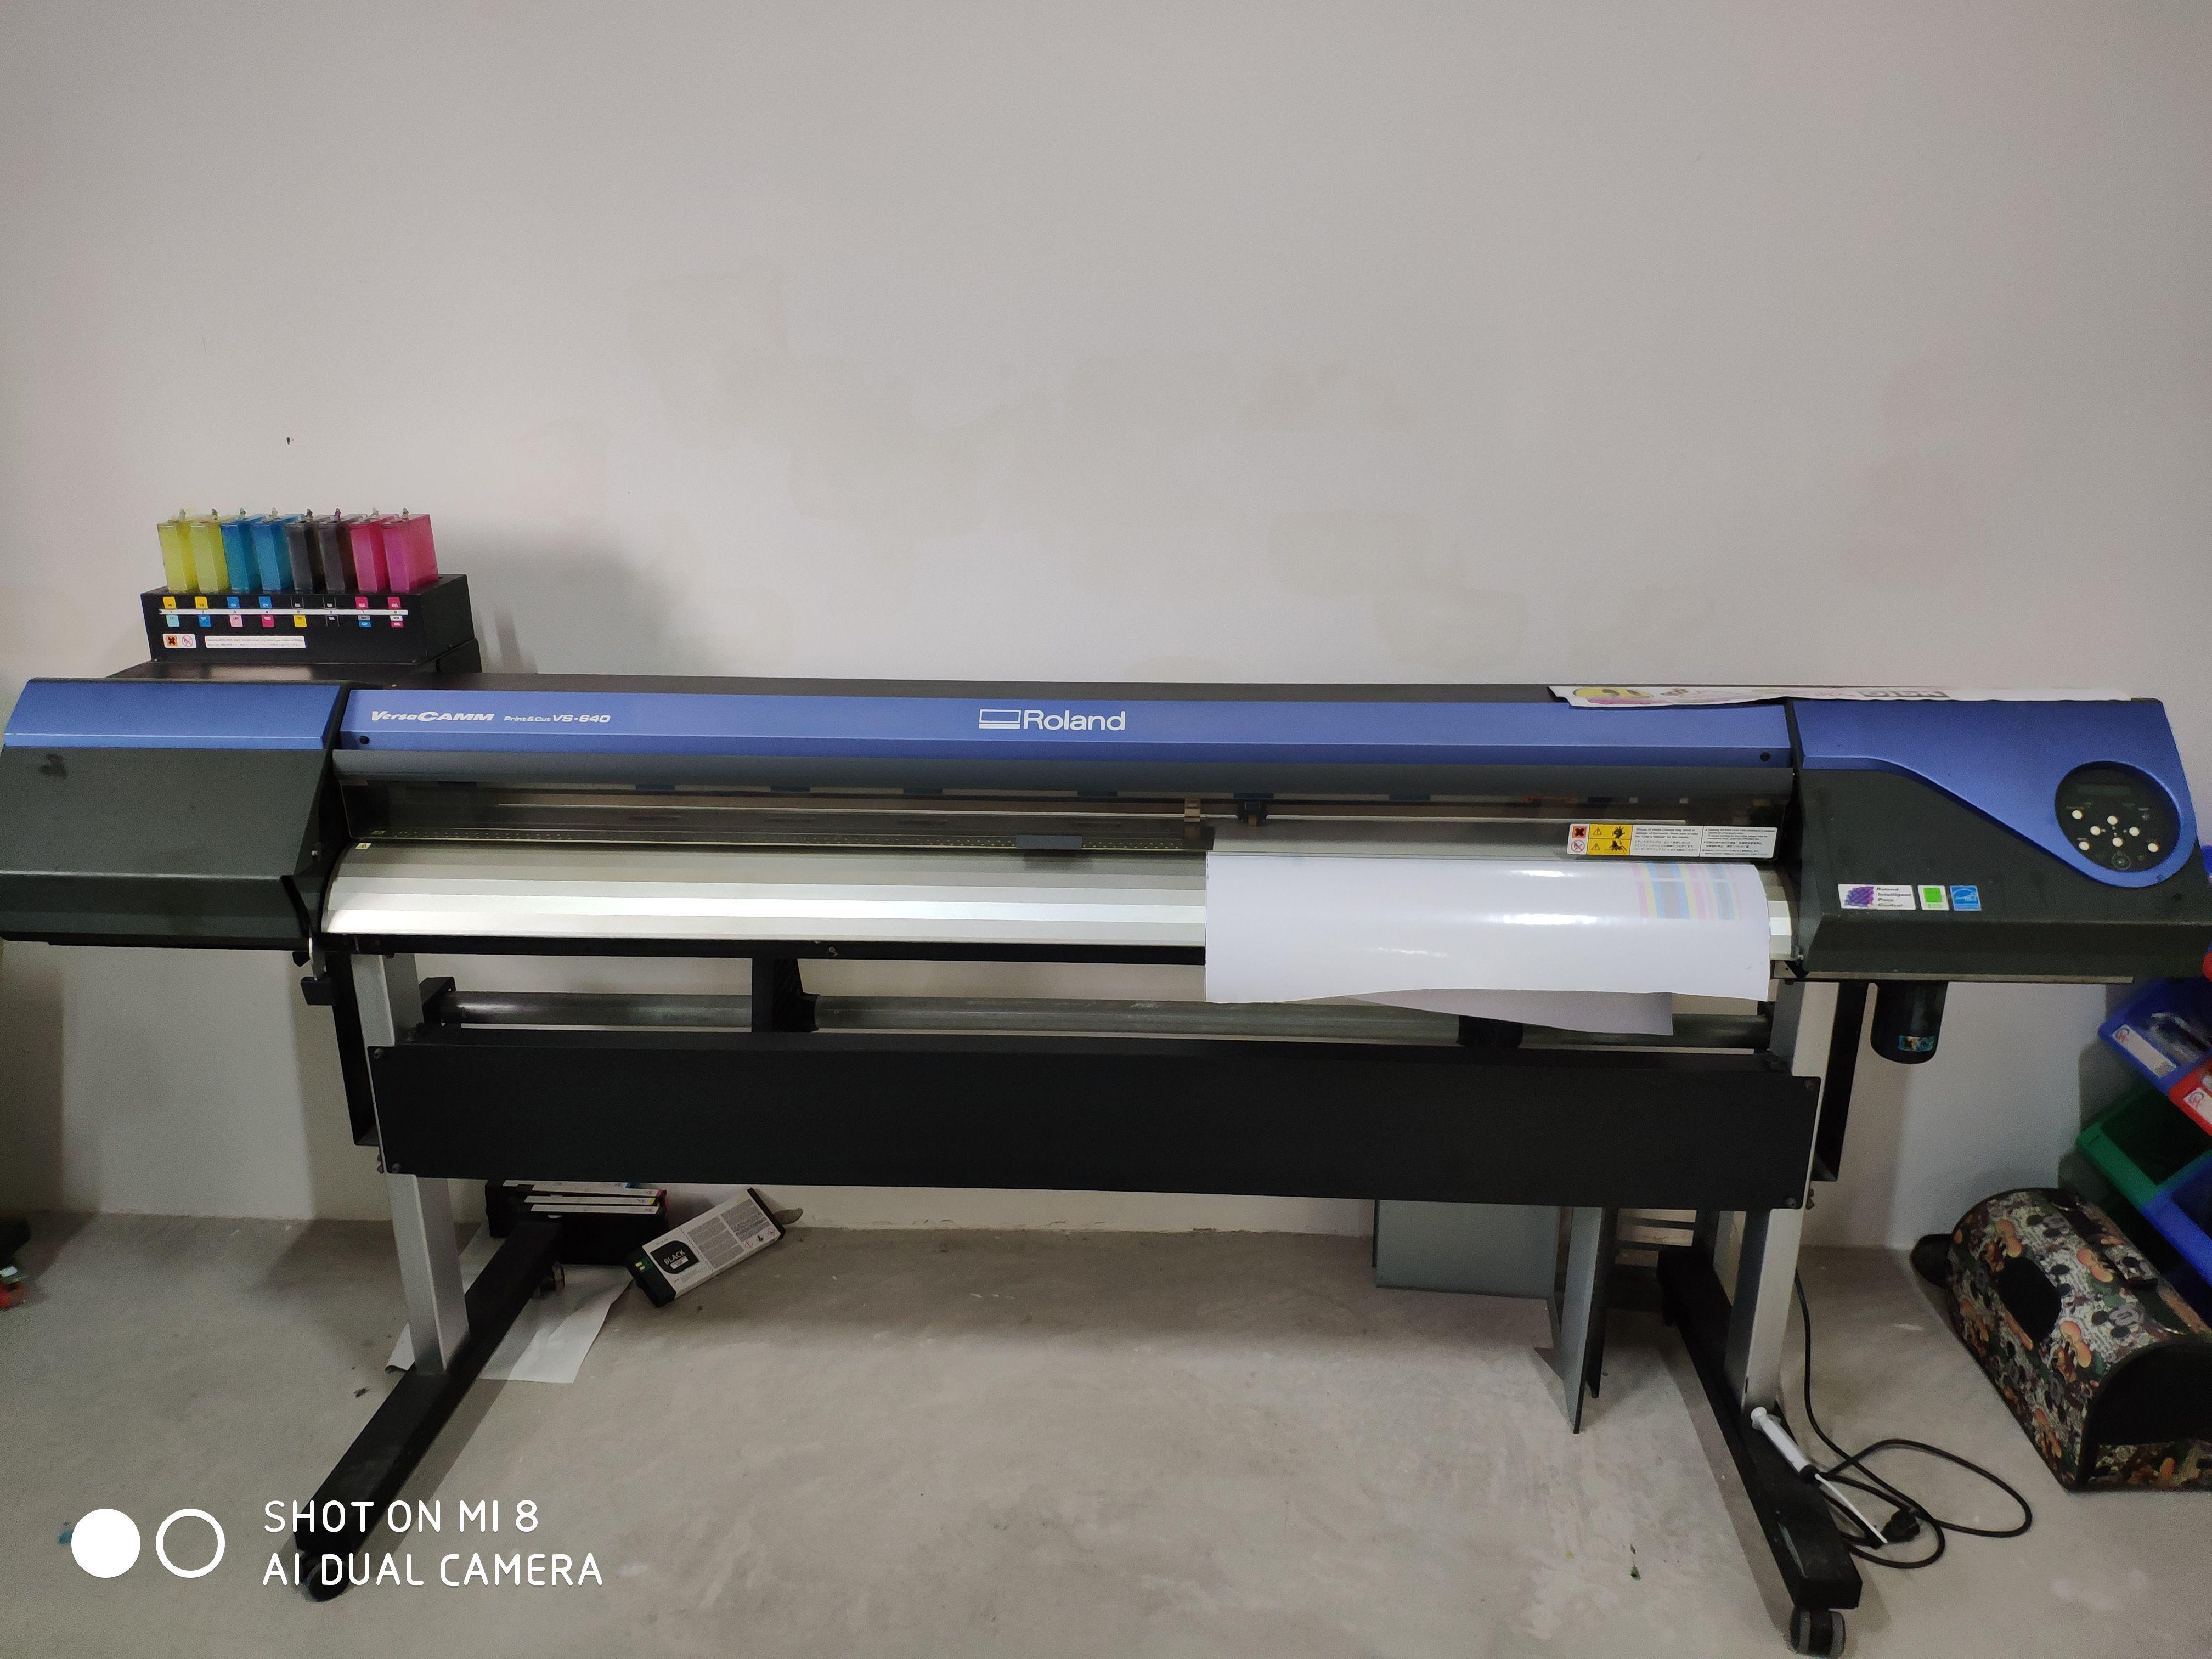 Roland VS-640i Inkjet Printers/Cutters | Second-hand Inkjet